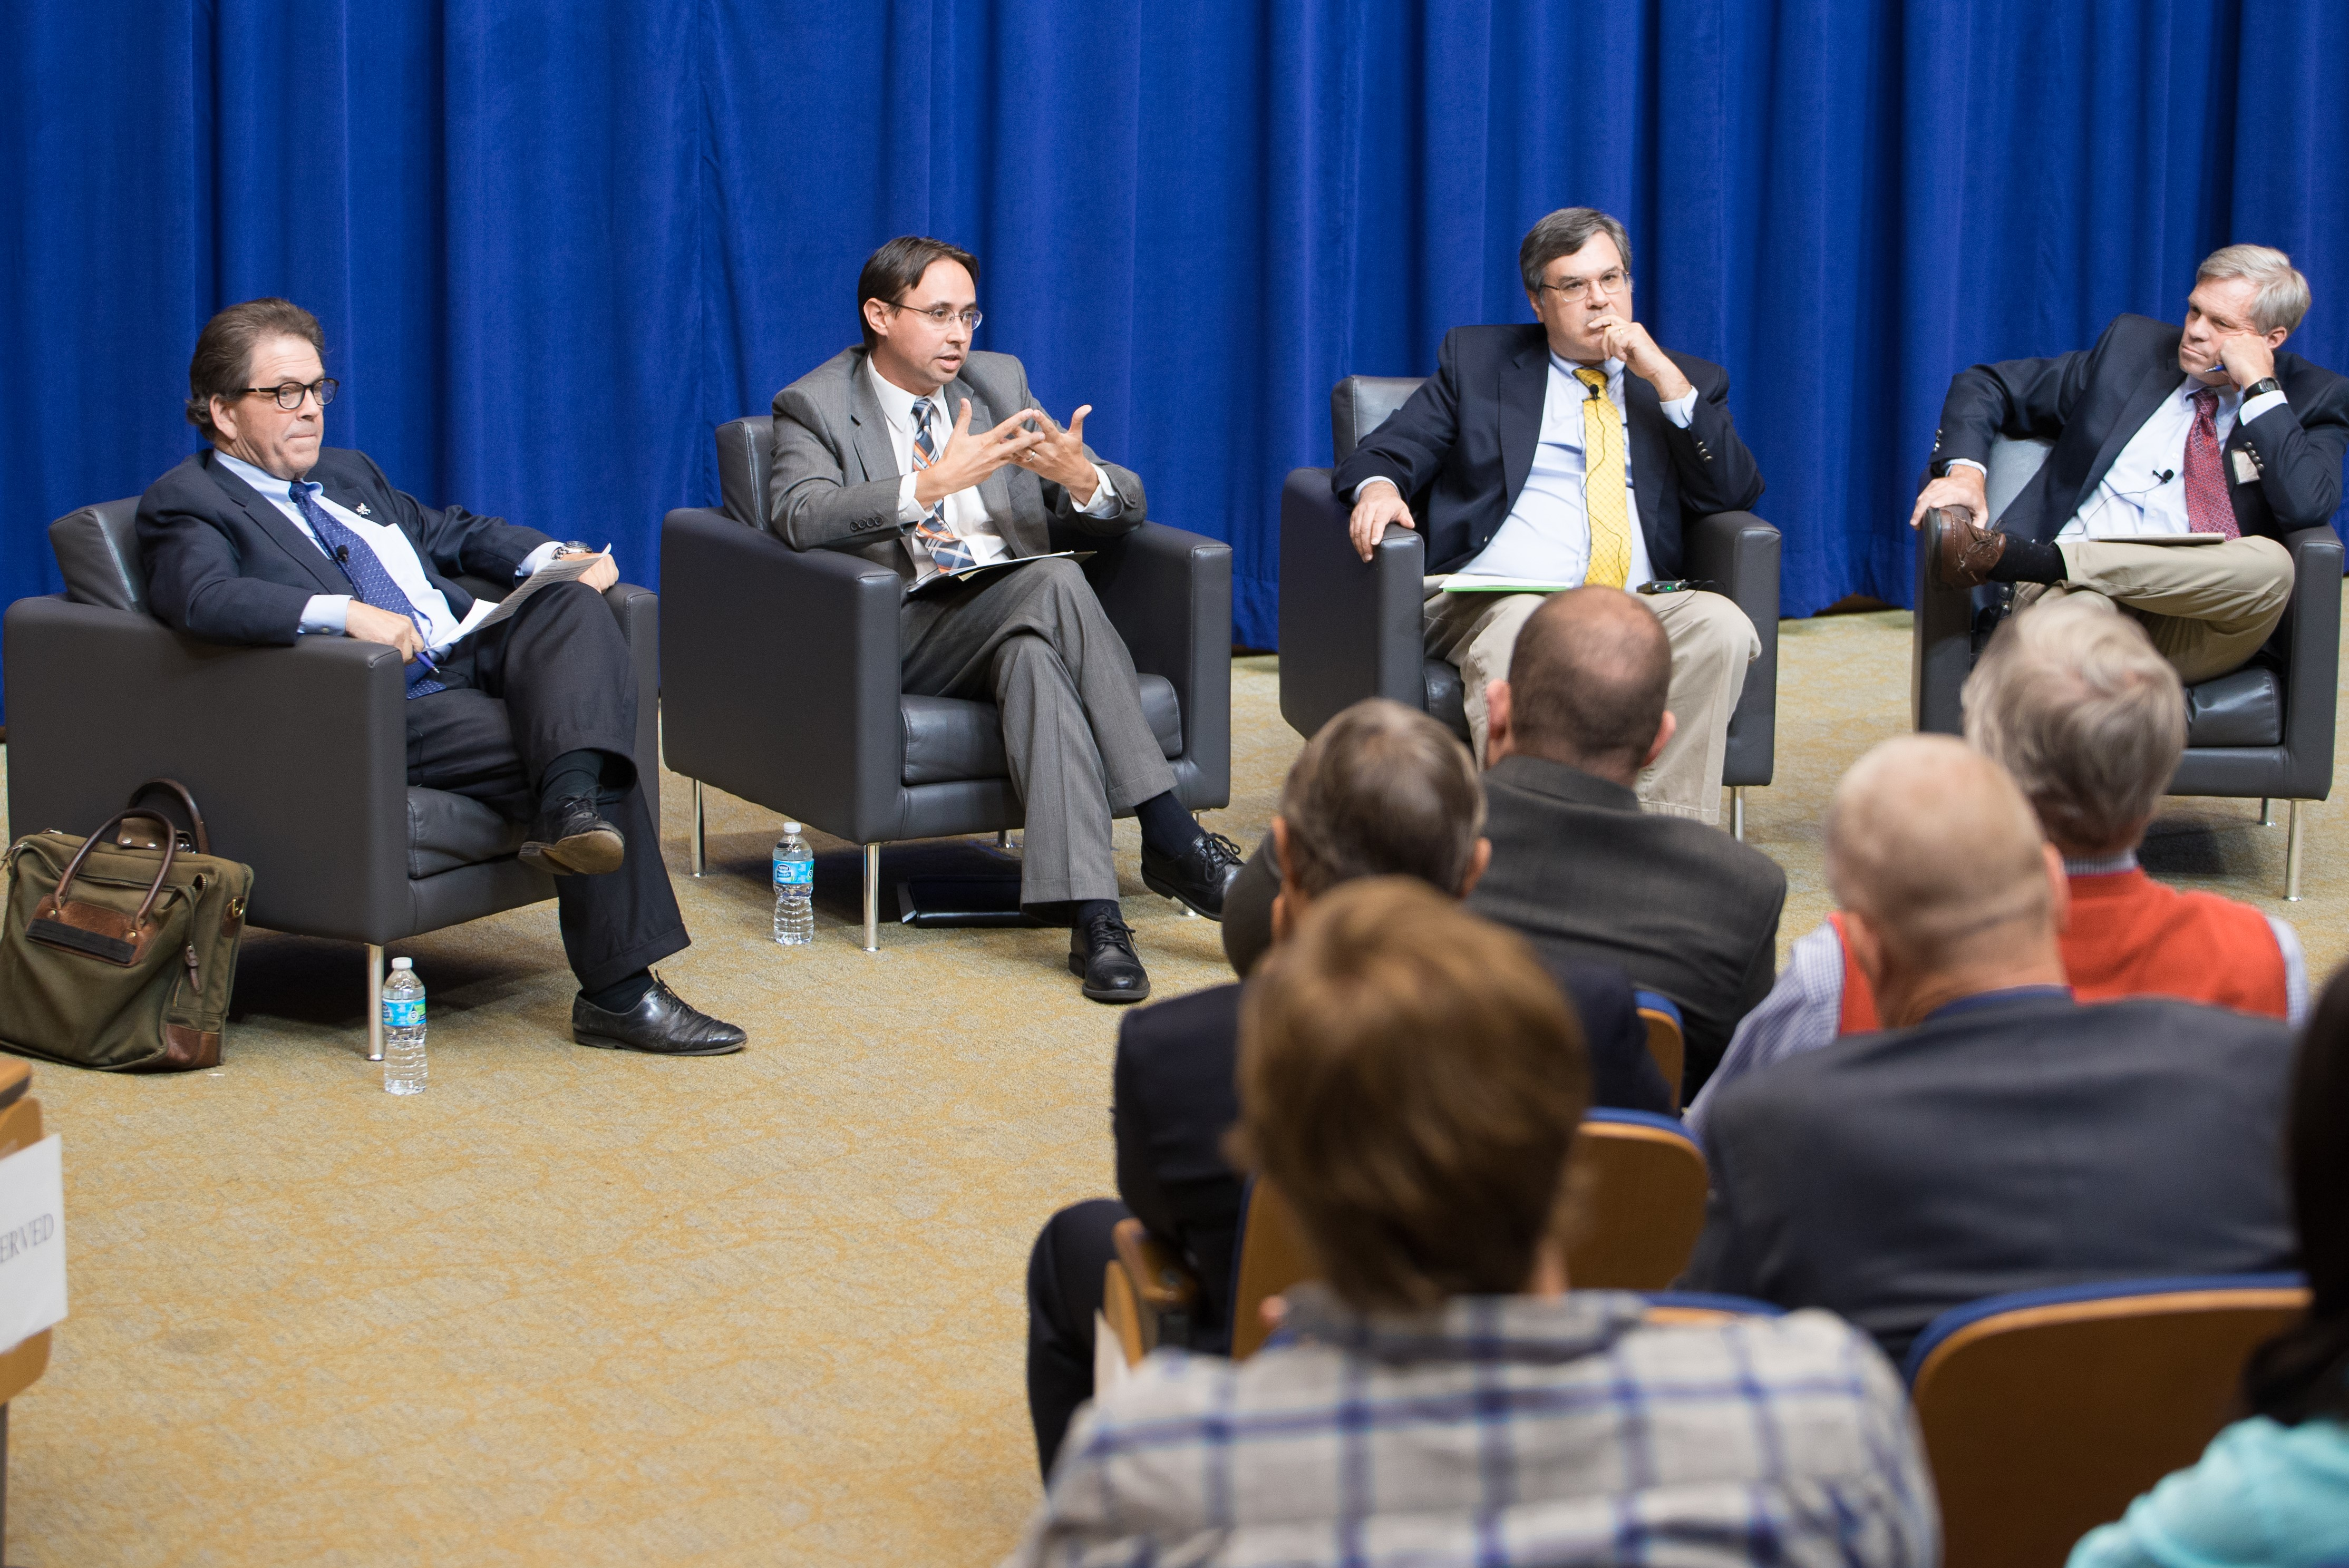 Dr. Arthur Laffer, Jason Bailey,  Dr. Chris Bollinger & Dr. William Hoyt